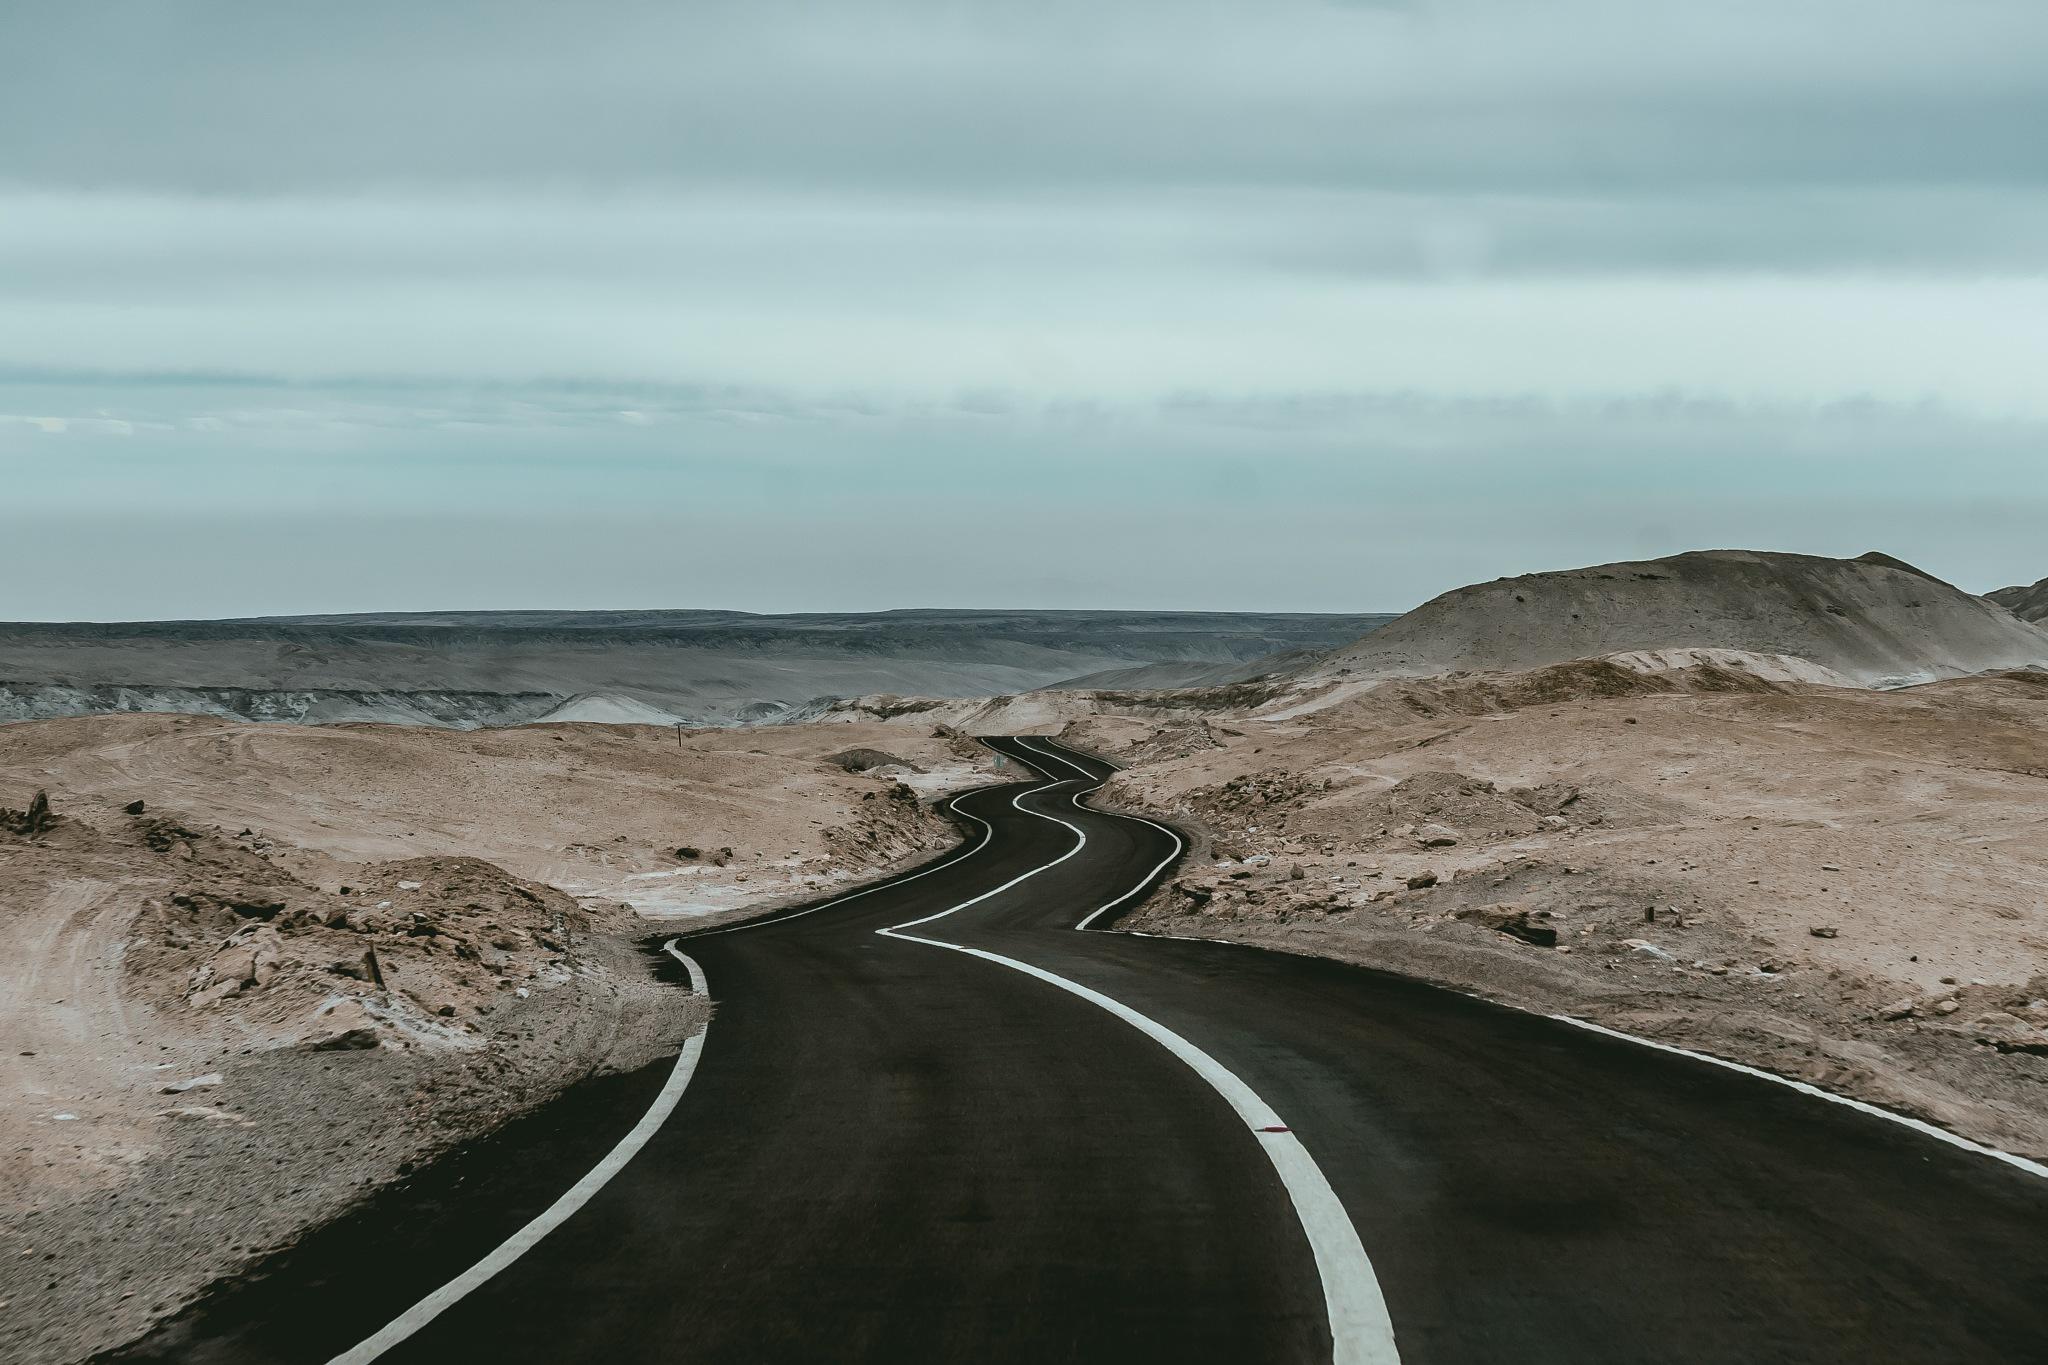 Desert Roads by Manuel Fuentes